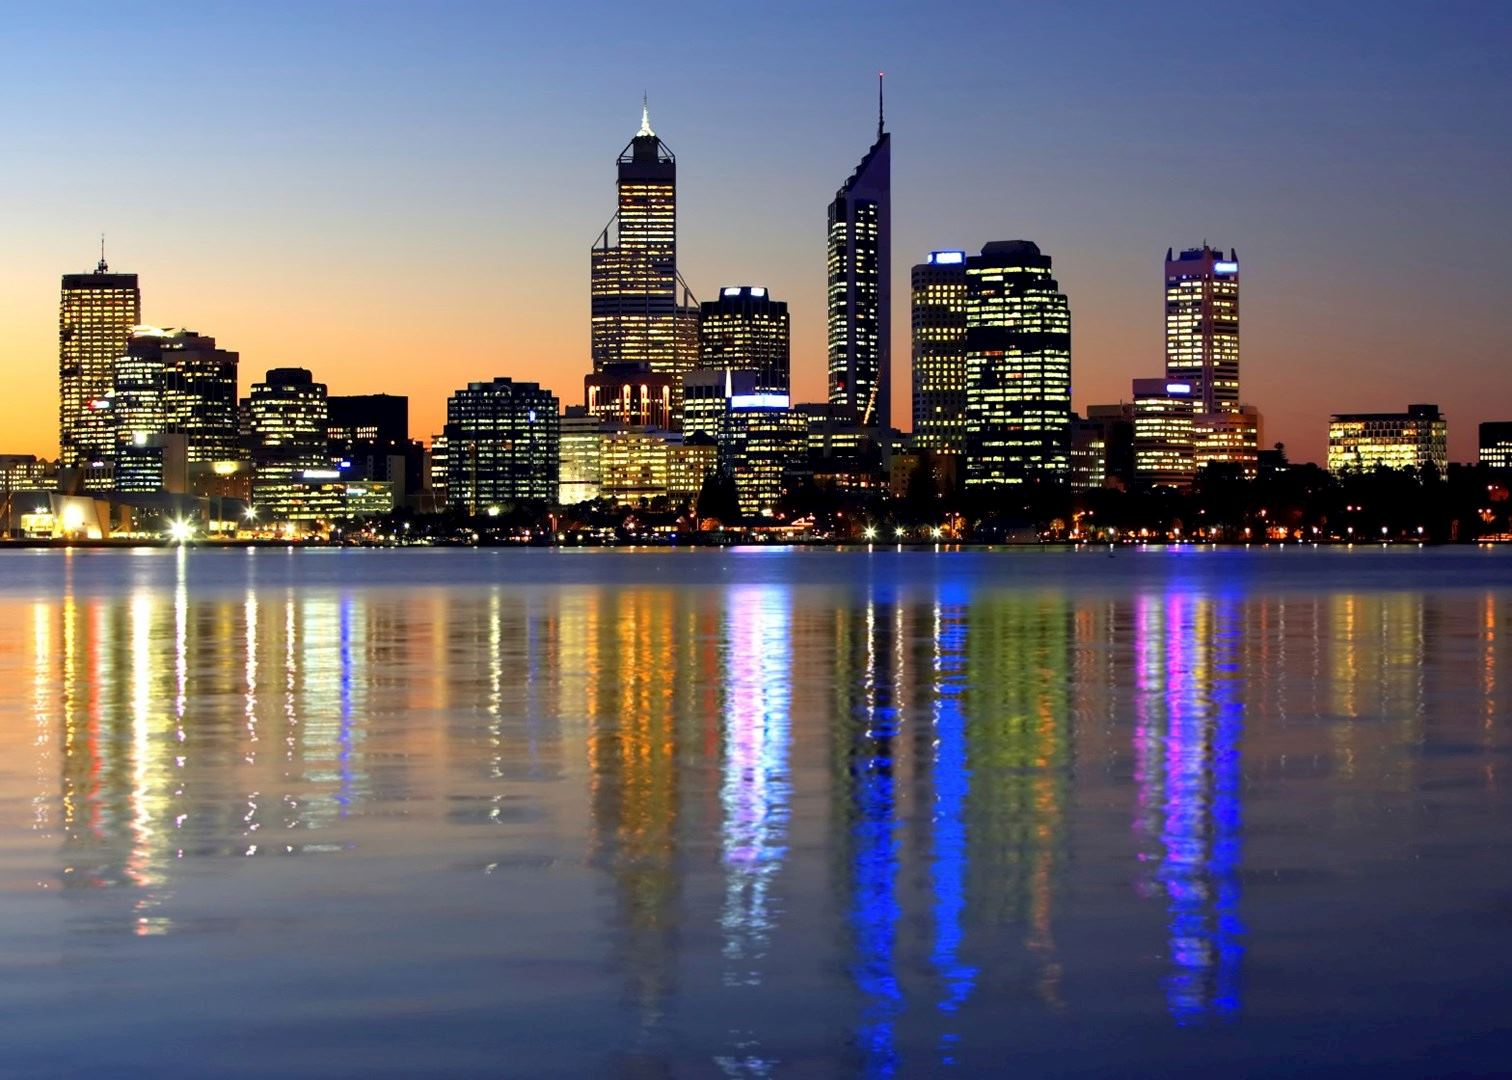 visit perth on a trip to australia